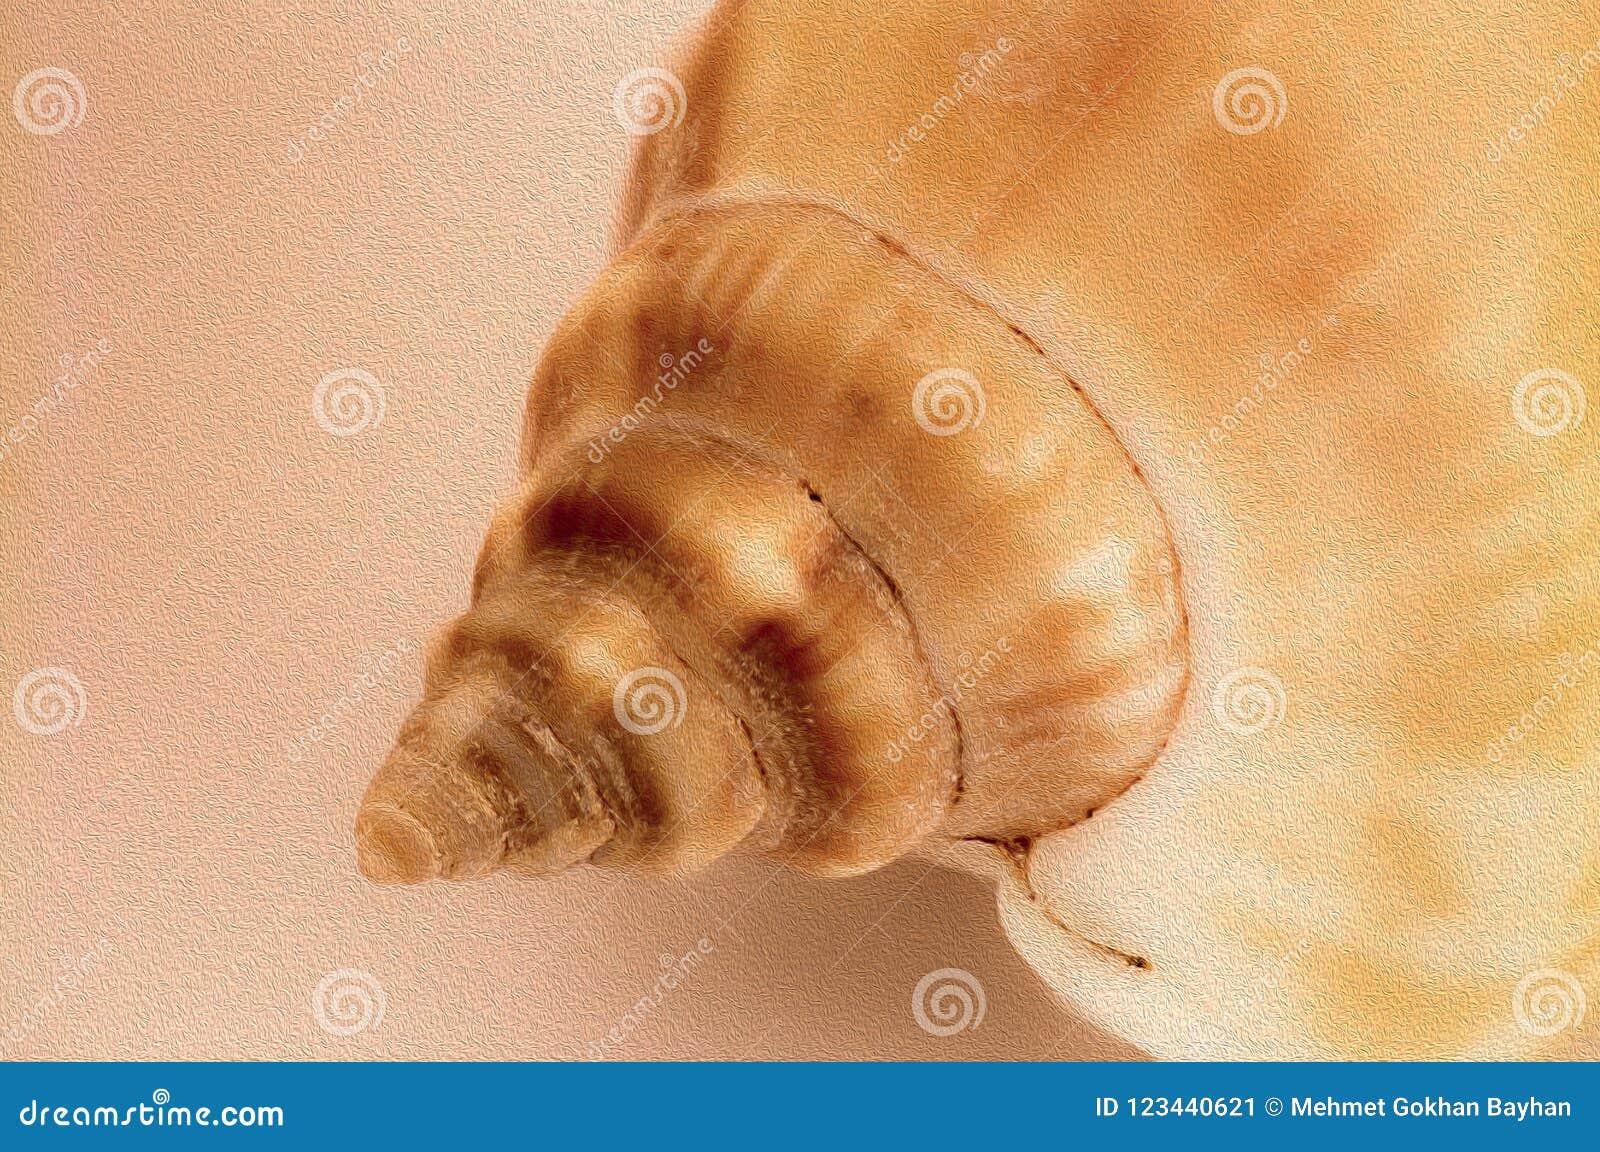 Sea shell close-up background image